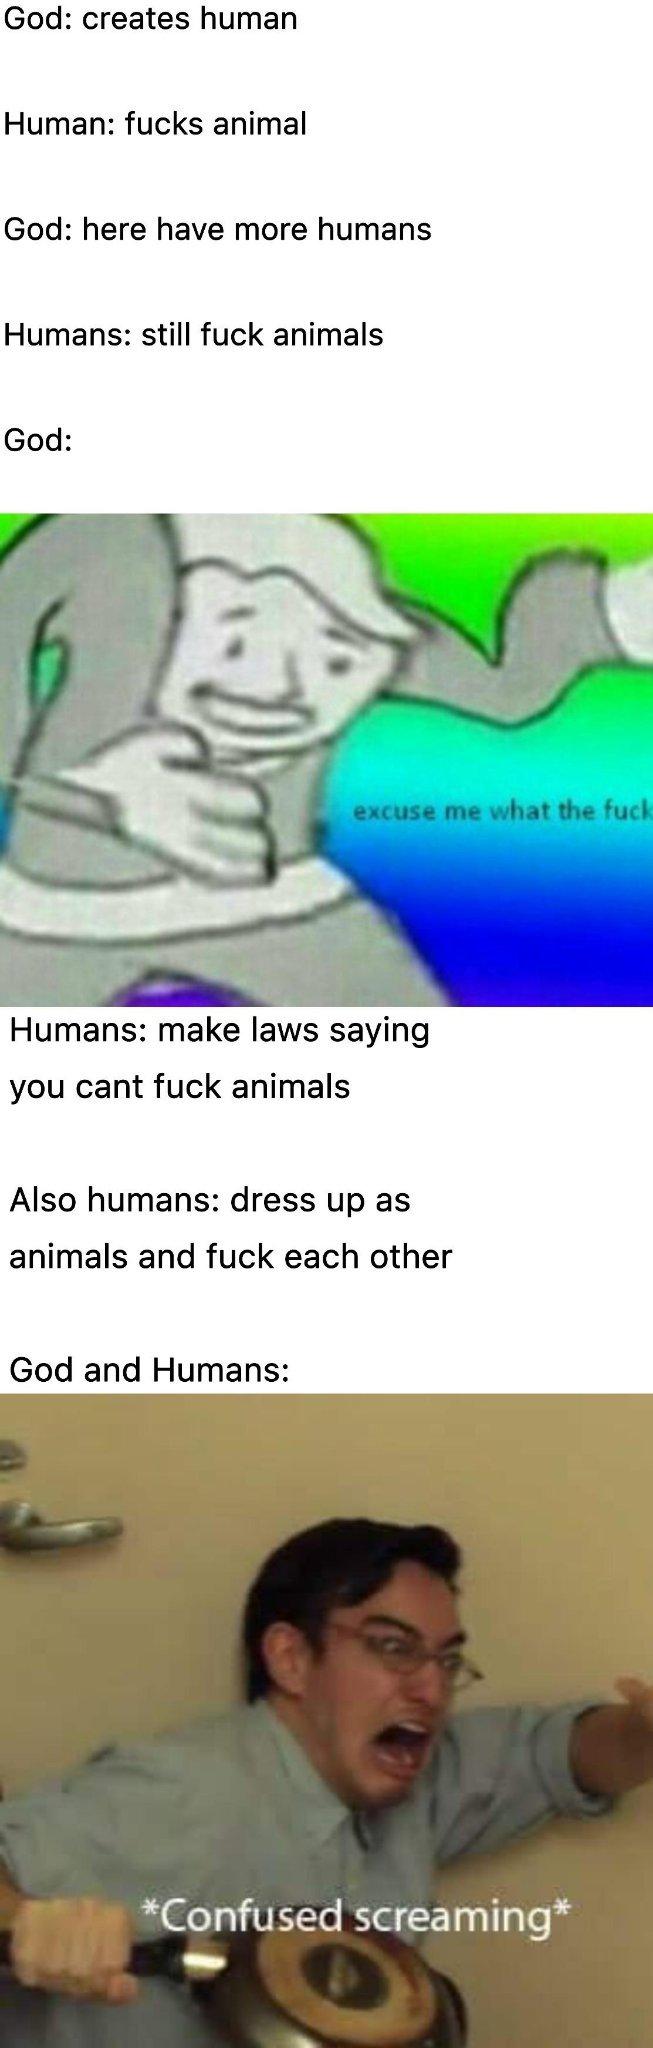 Animal orgy - meme